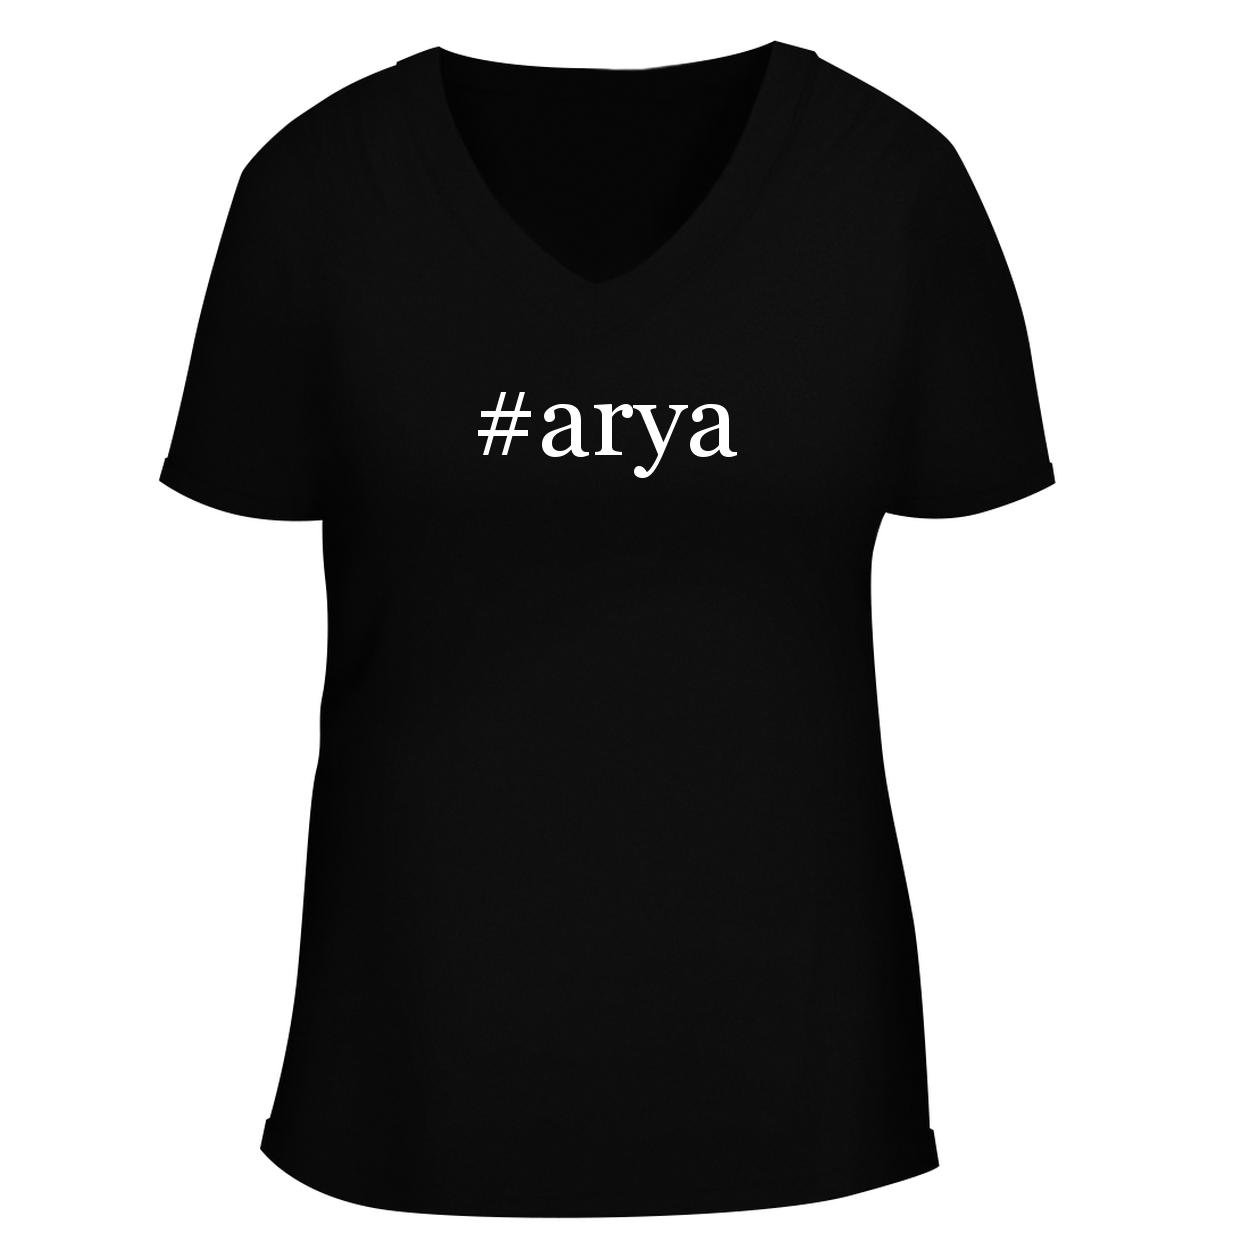 Arya Cute Graphic Tee 9049 Shirts